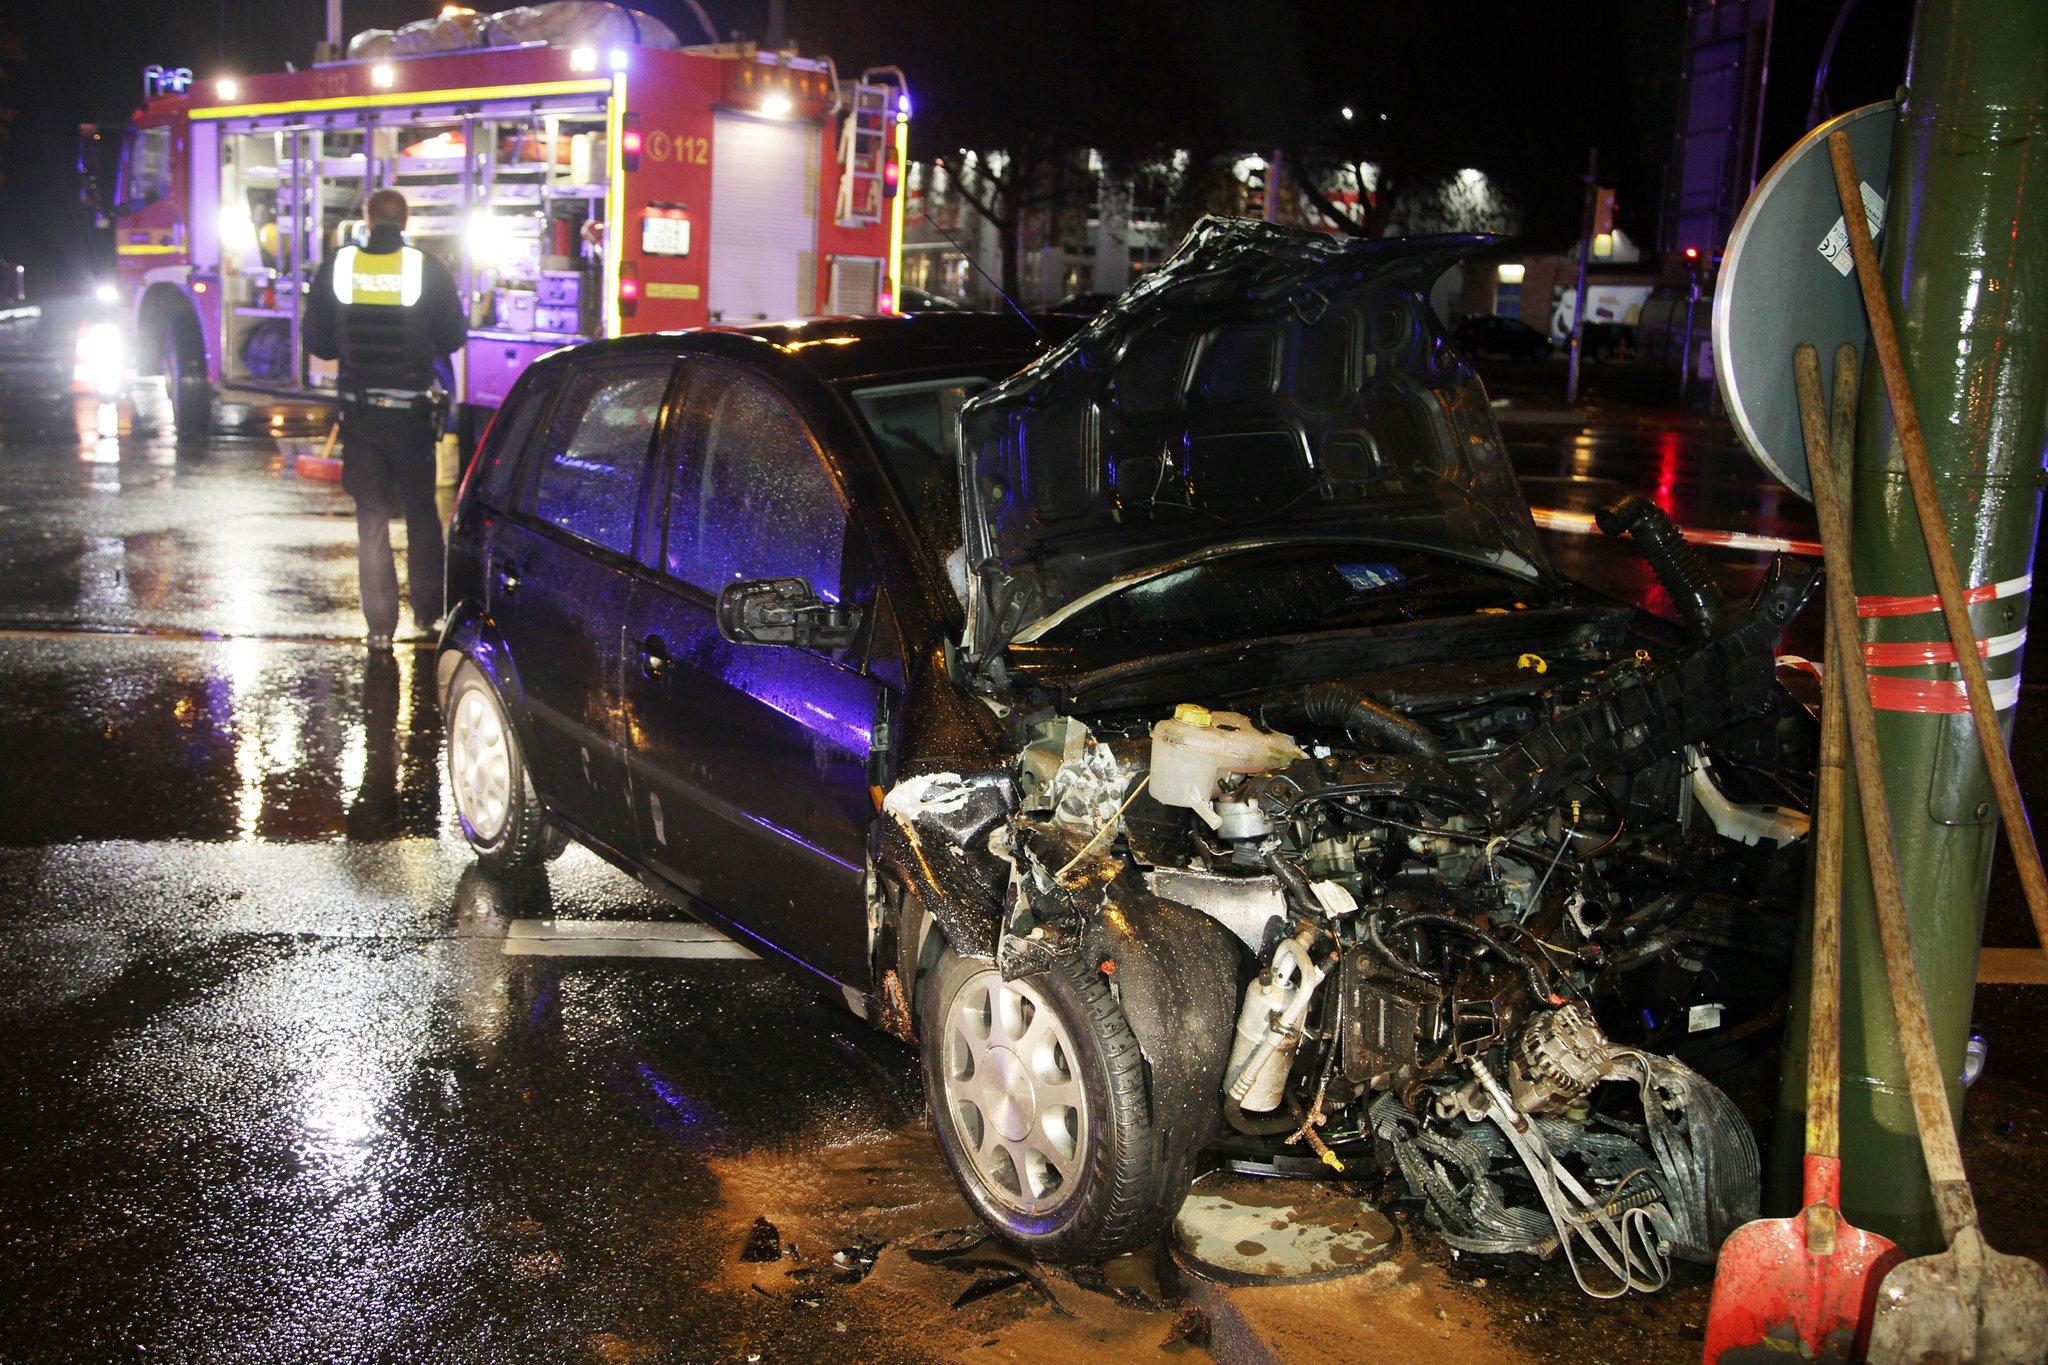 Auto prallt in Rettungswagen im Einsatz - Lünen - Lokalkompass.de